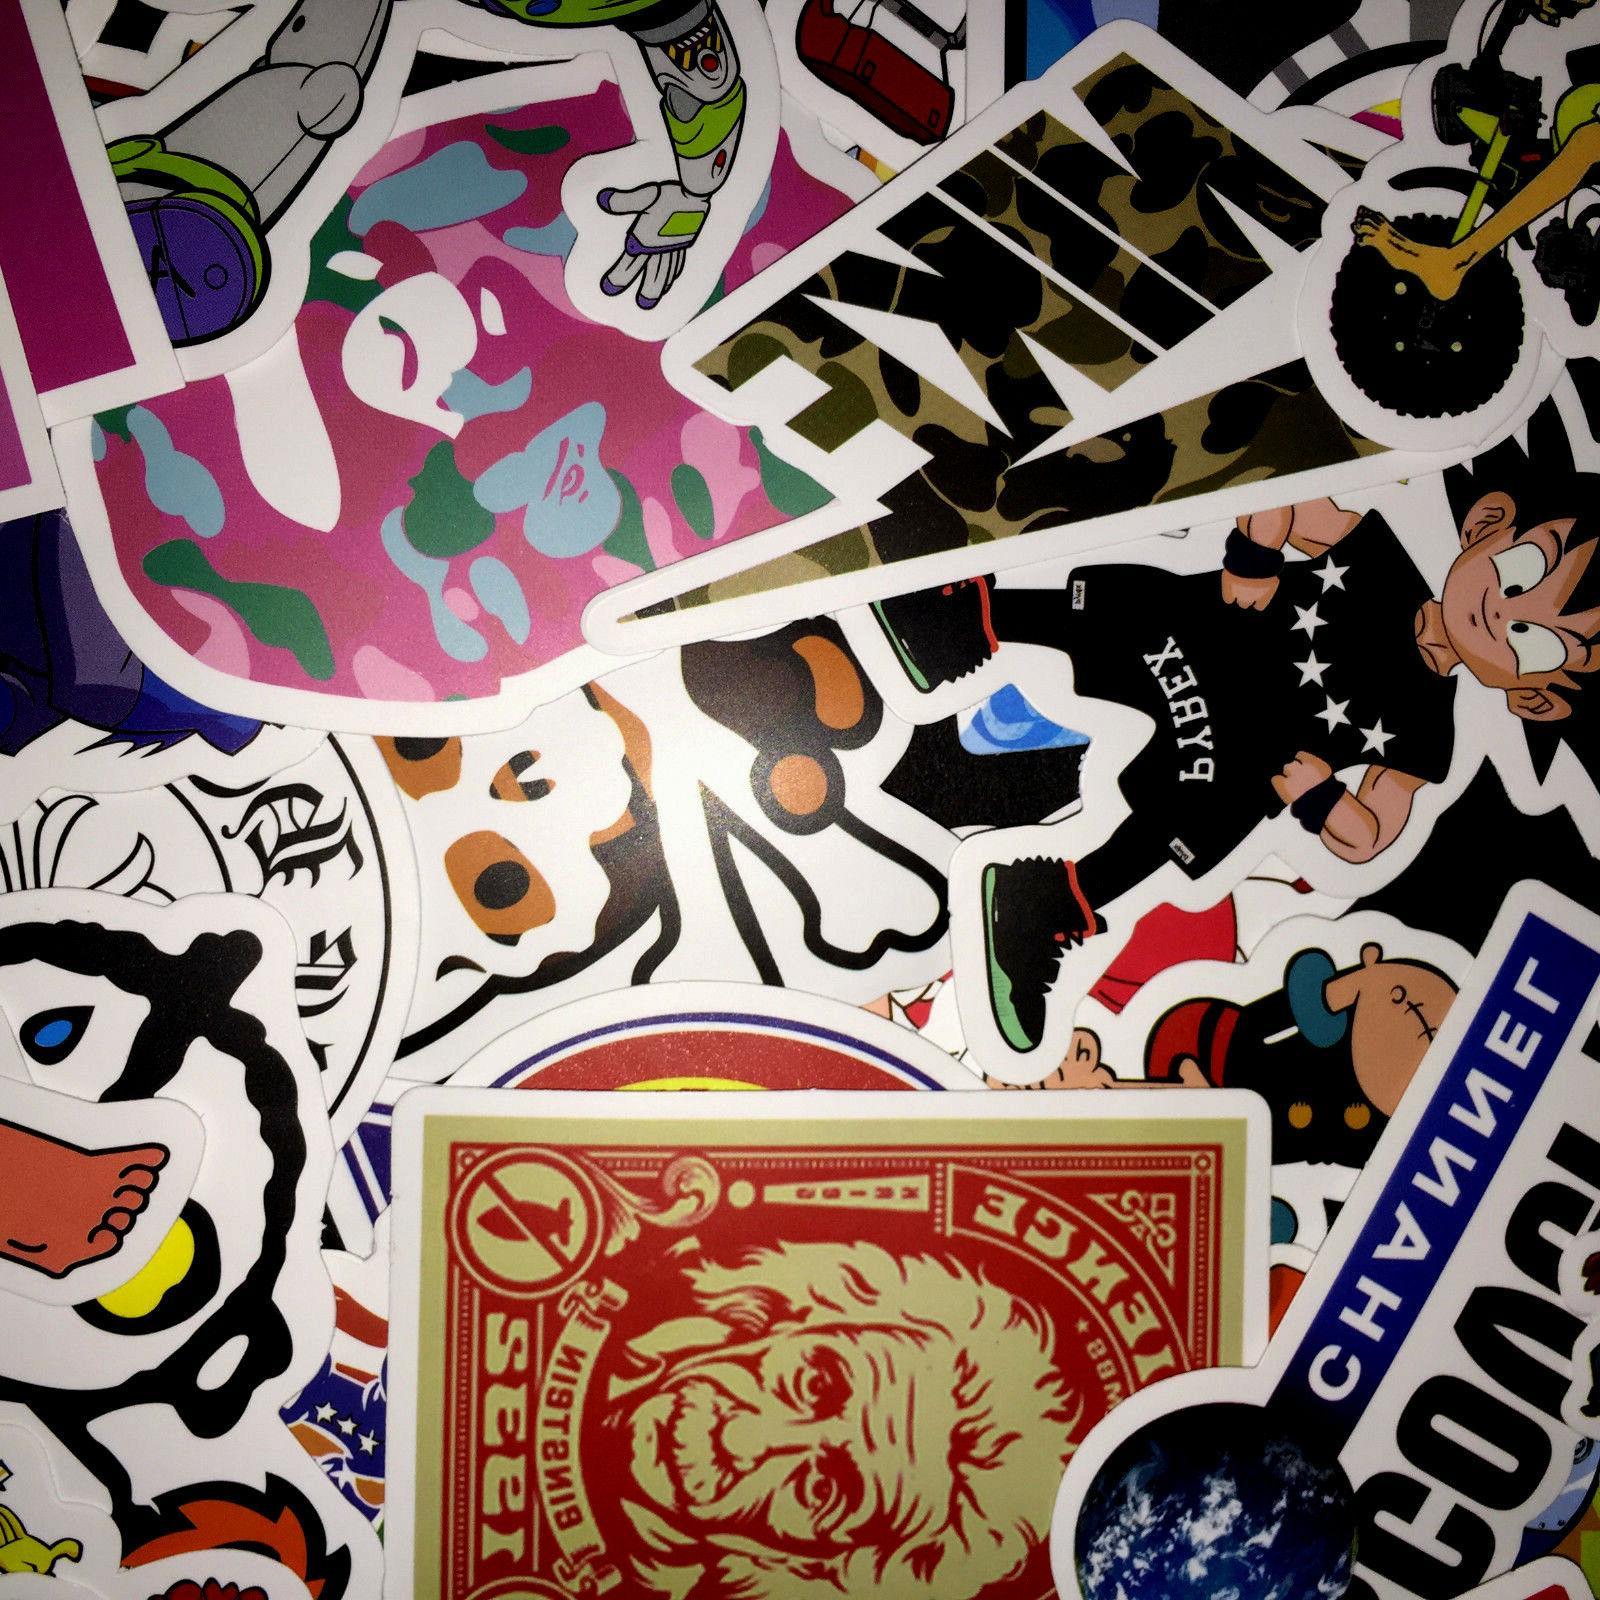 50 Random Vinyl Dope Sticker